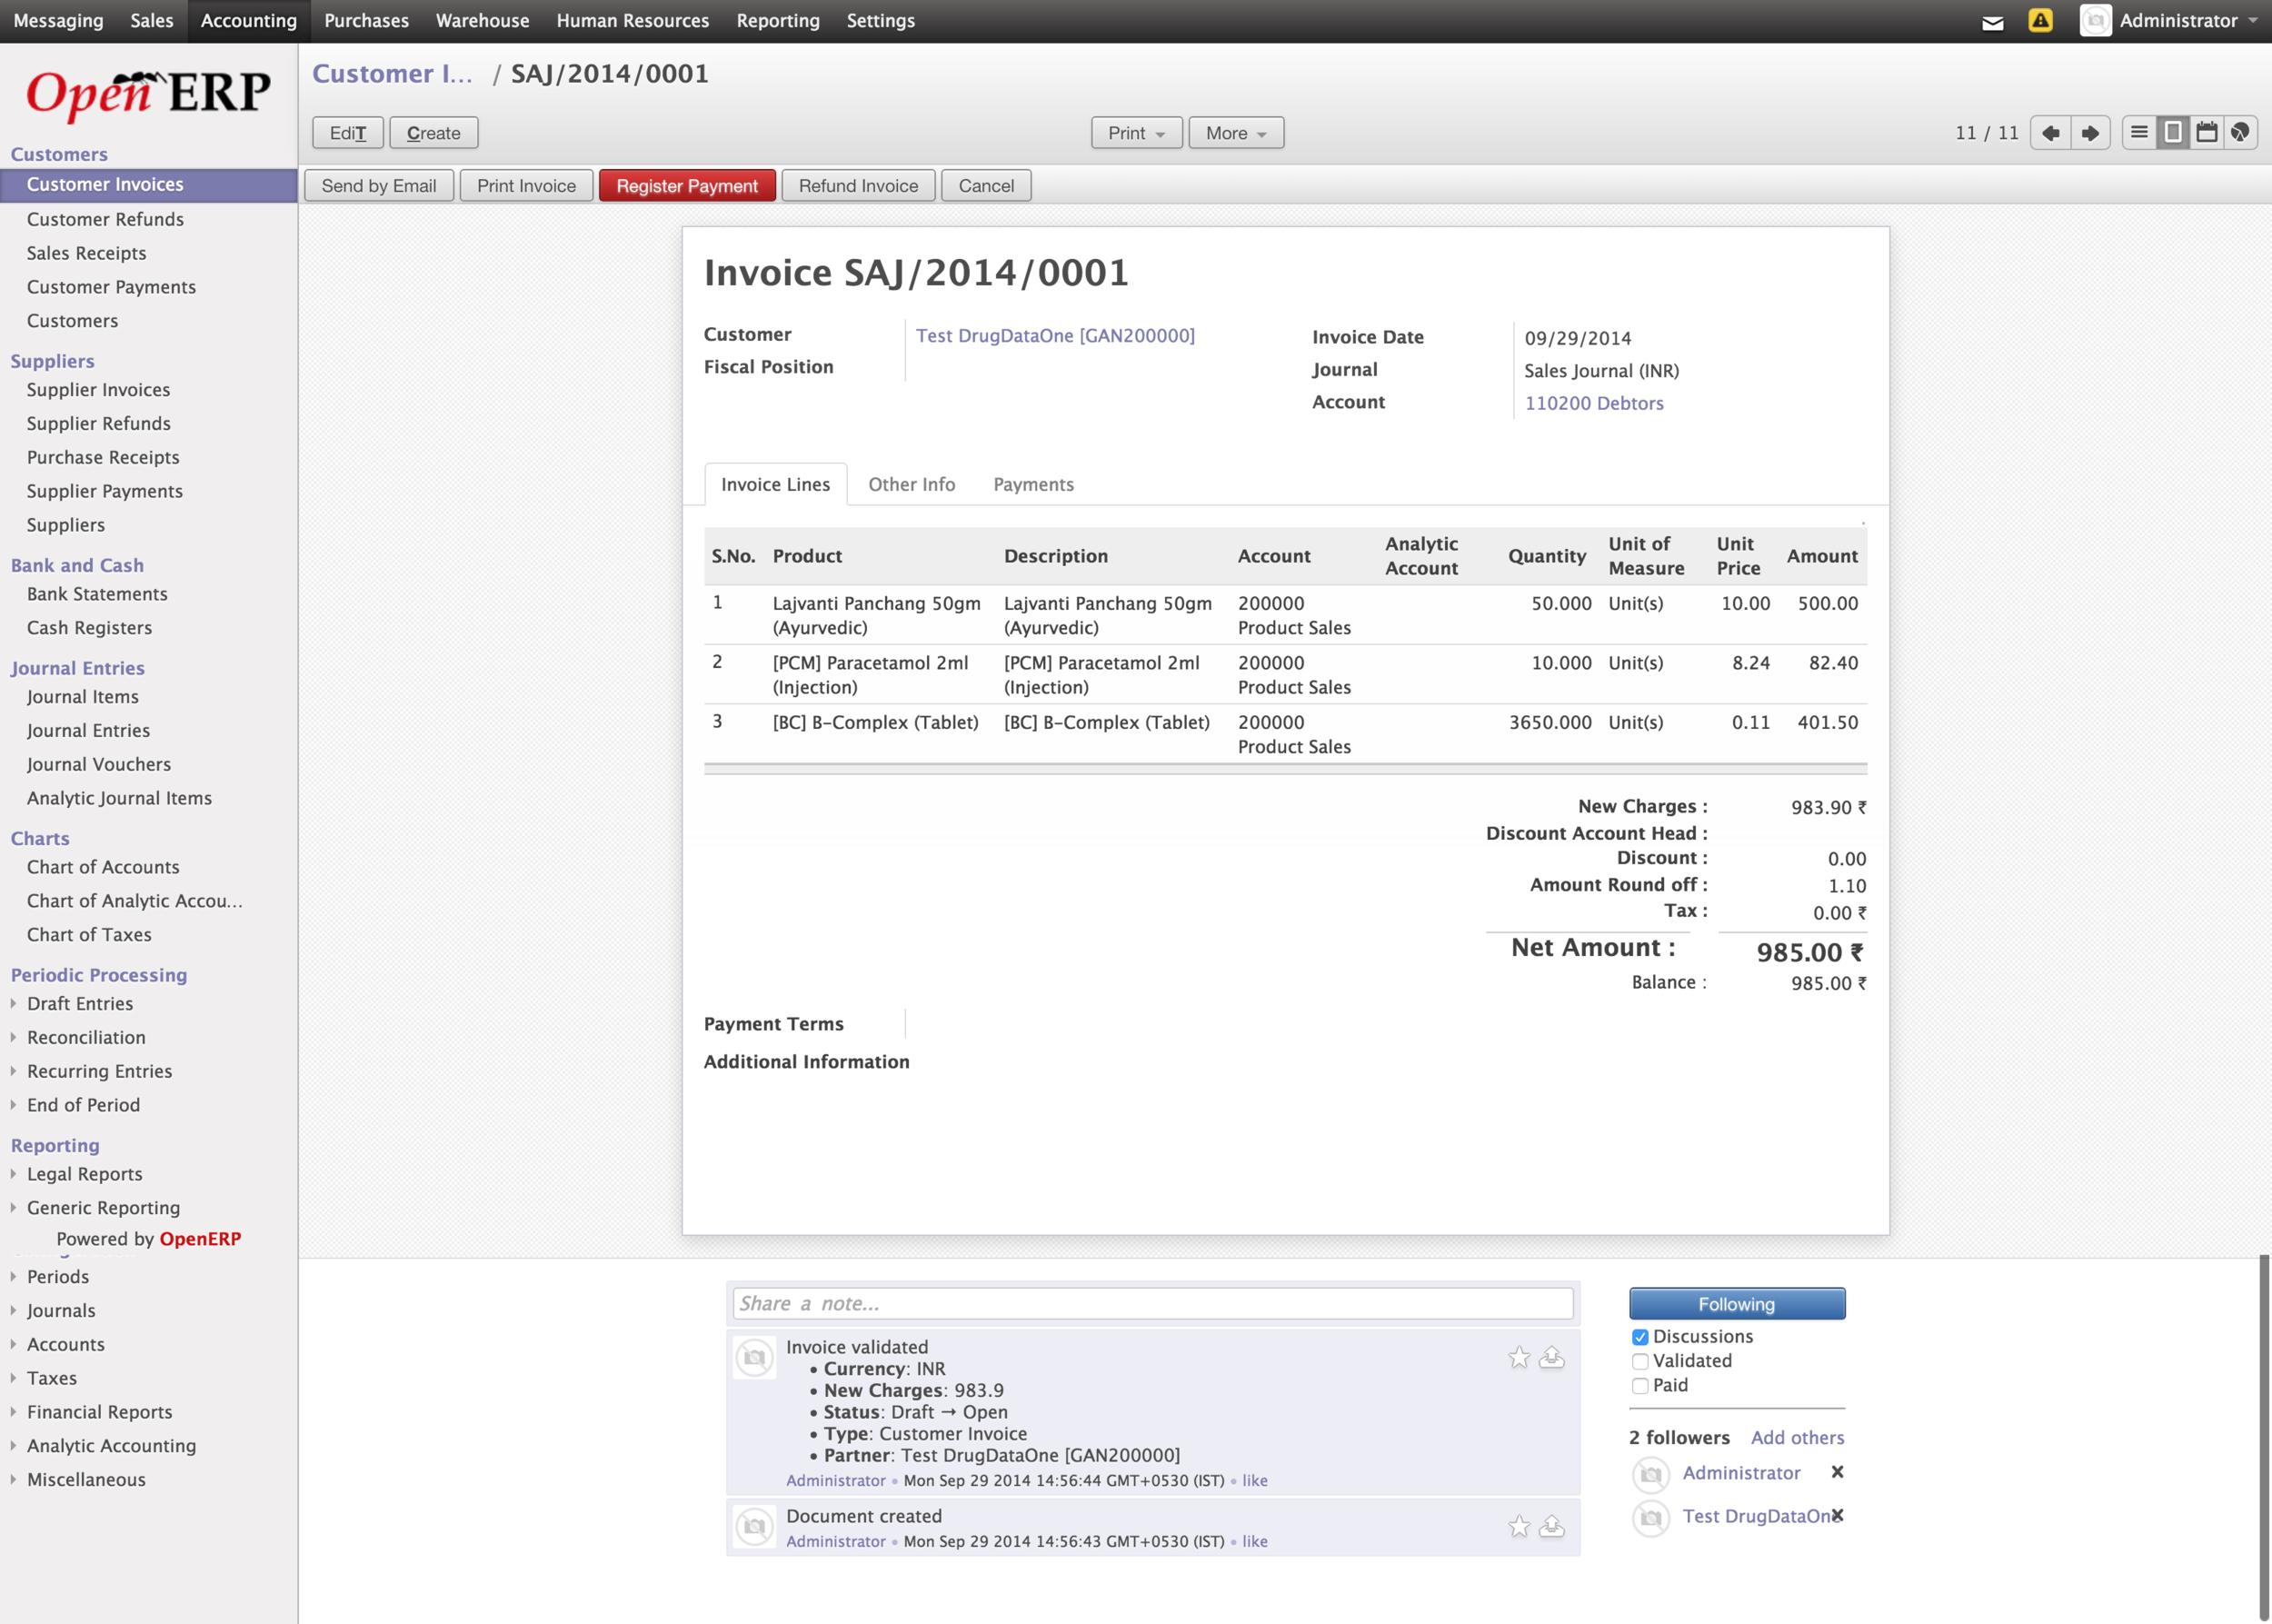 ERP - Customer Invoice